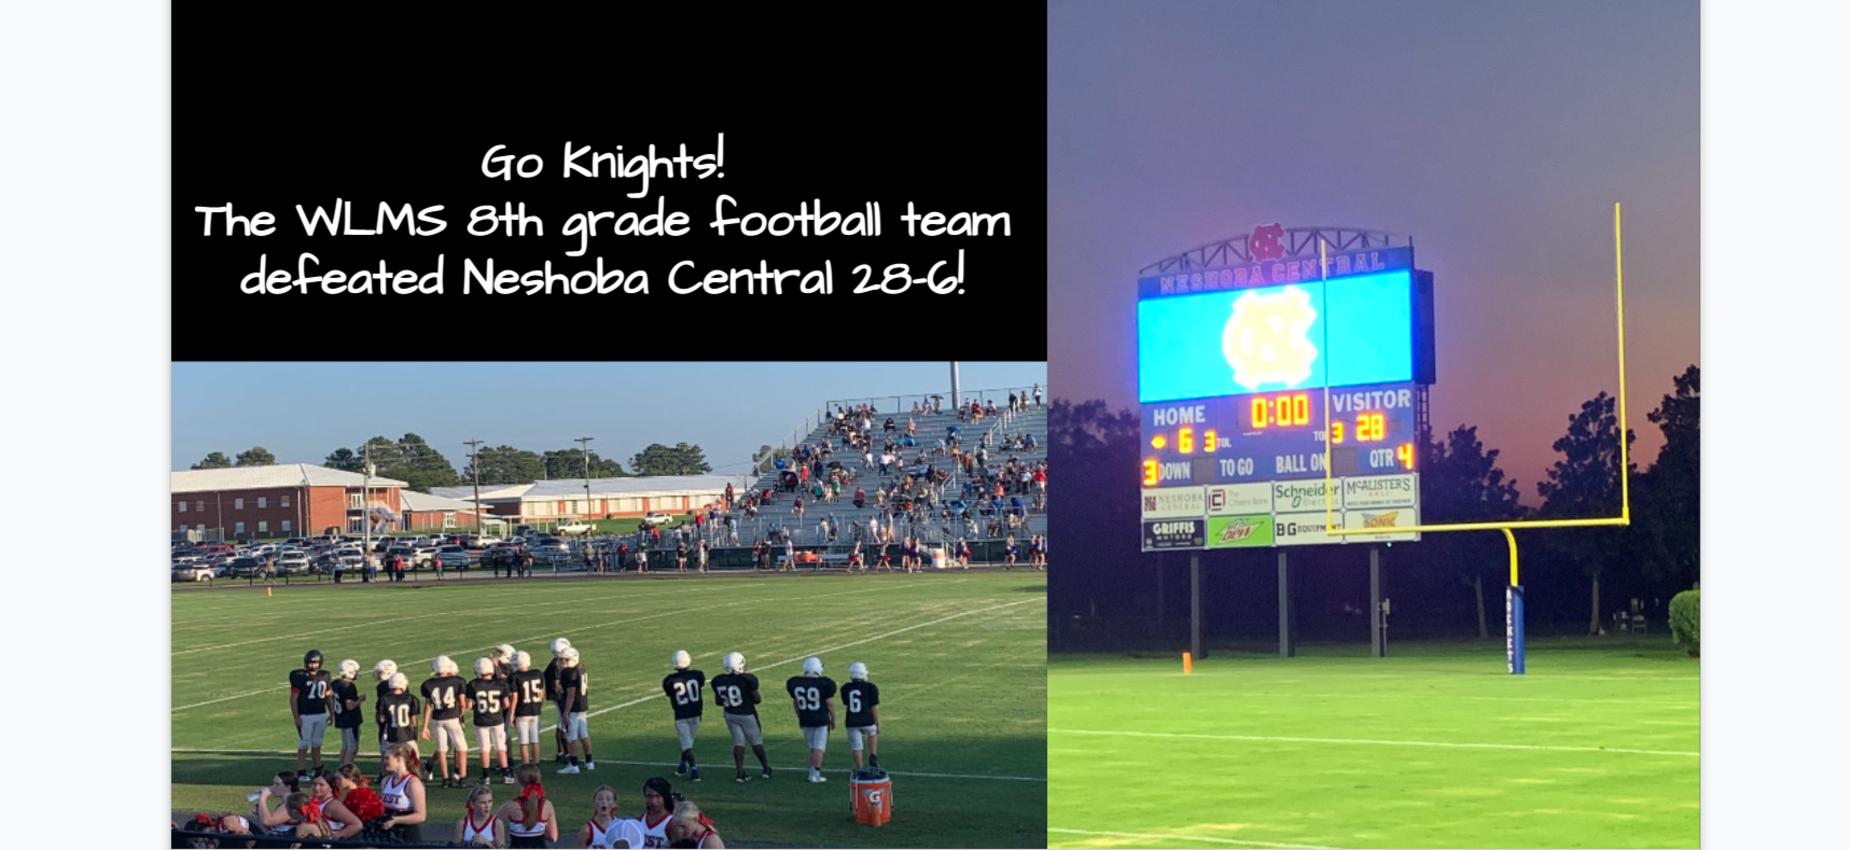 WLMS 8th grade football team defeated Neshoba Central 28-6